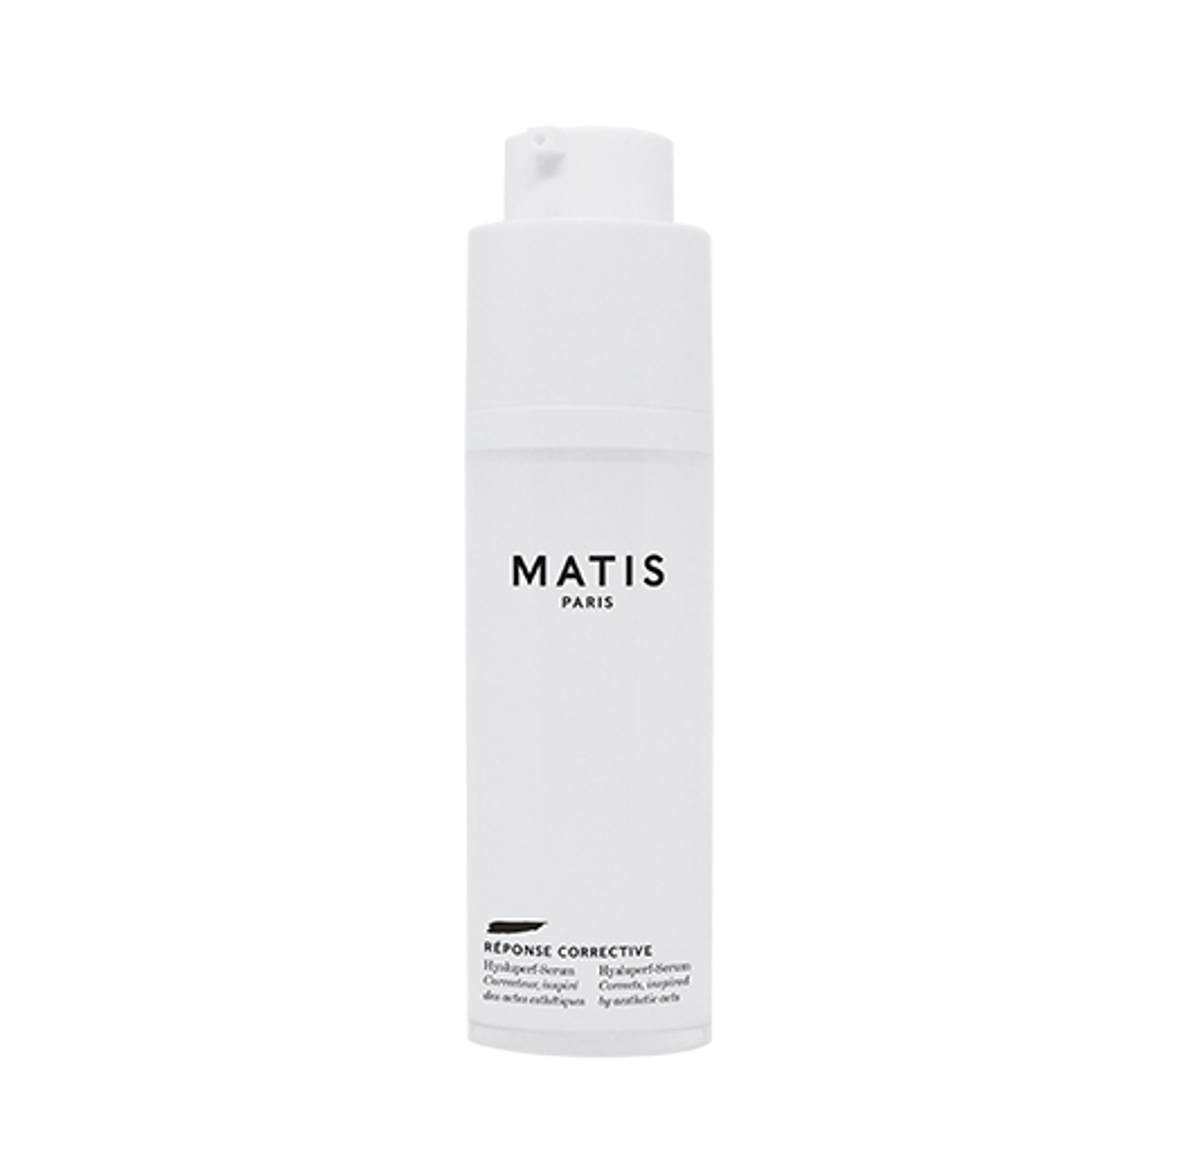 Matis Réponse Corrective Hyaluperf-Serum 30ml